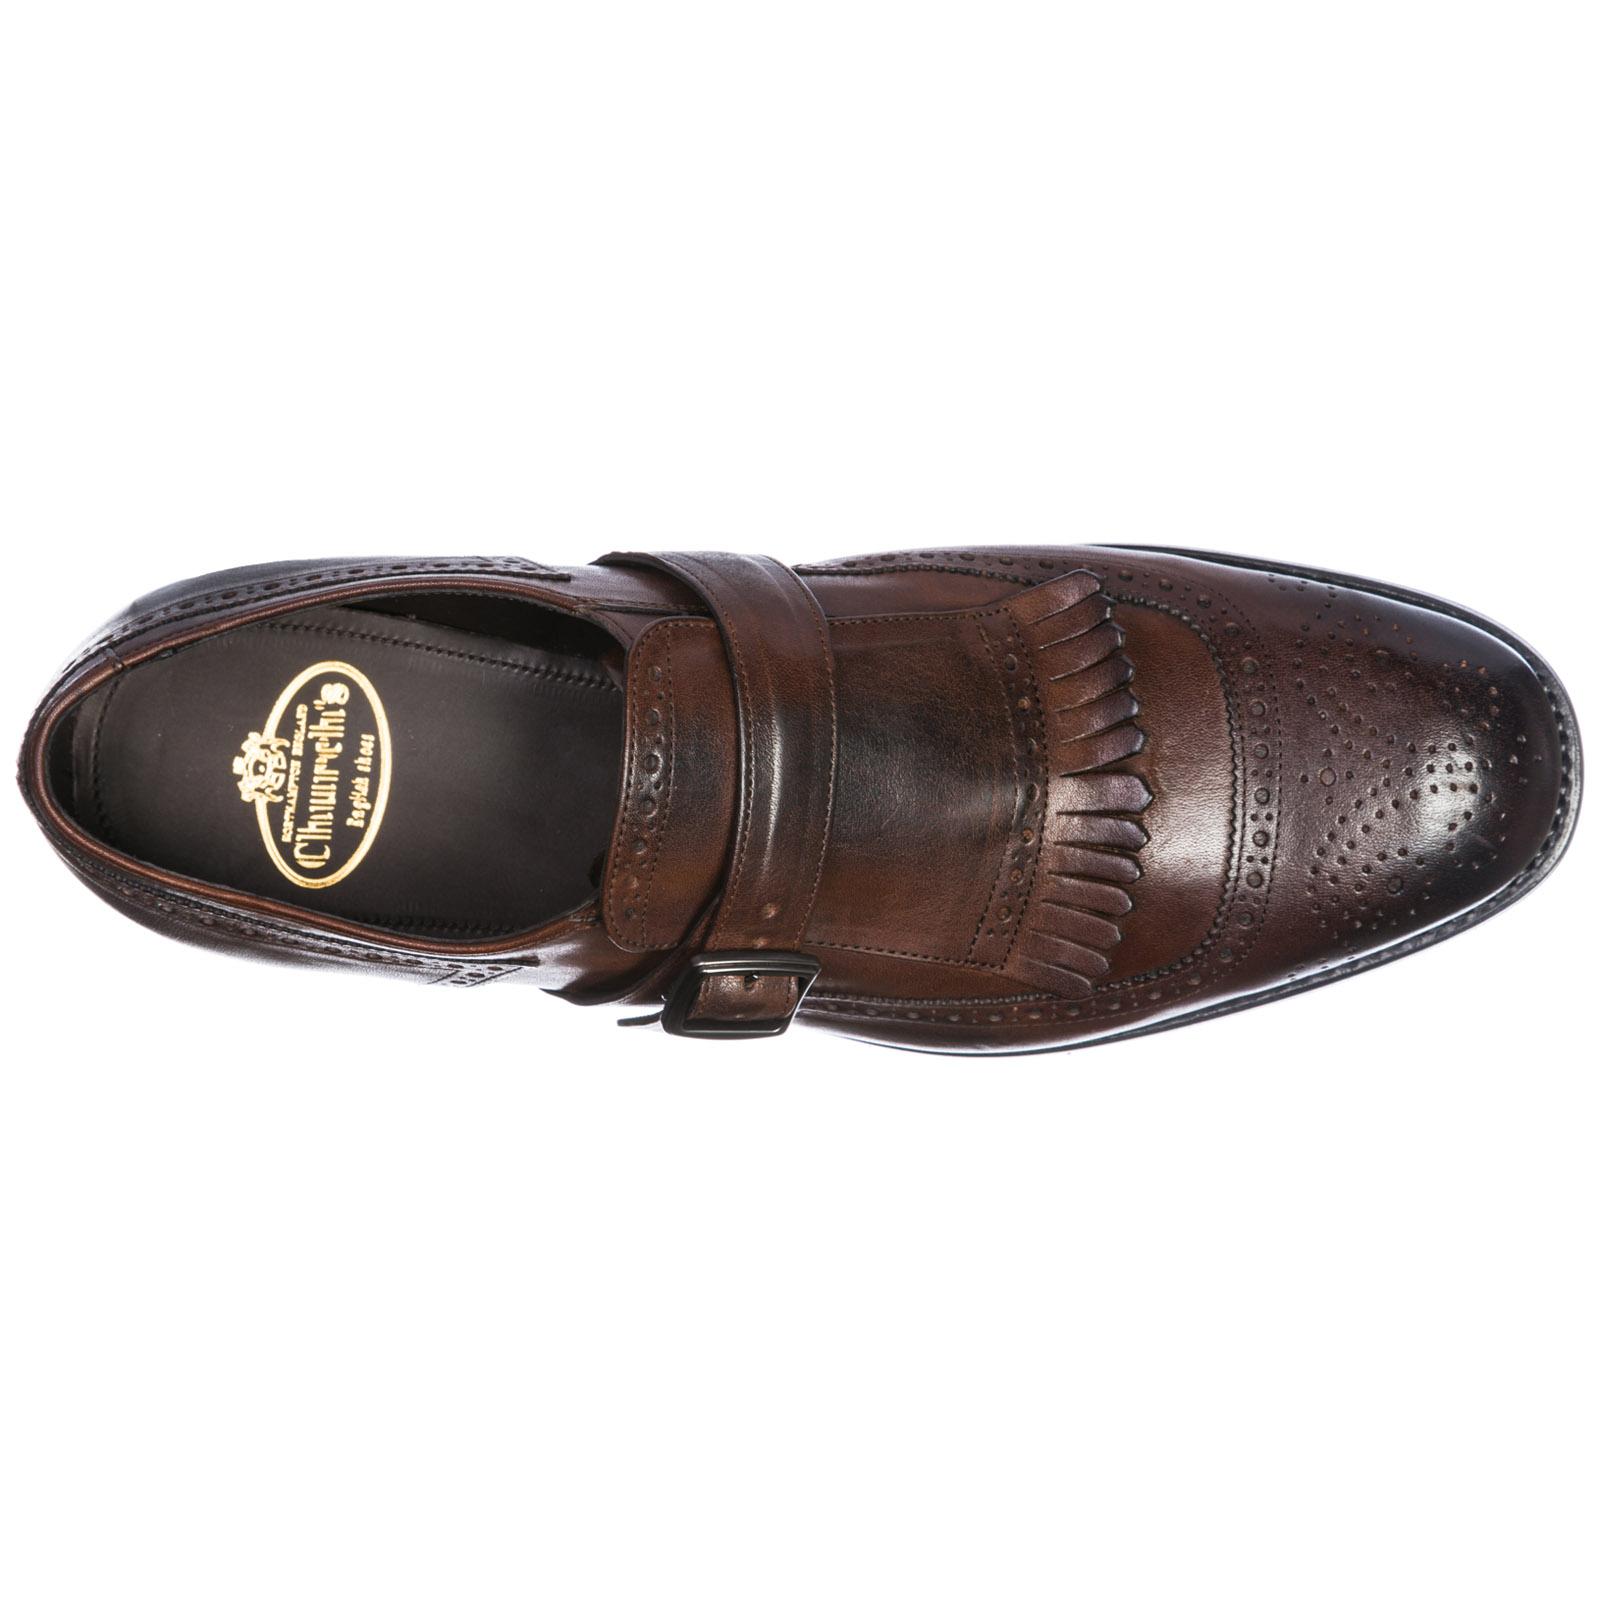 Men's classic leather formal shoes slip on monkstrap